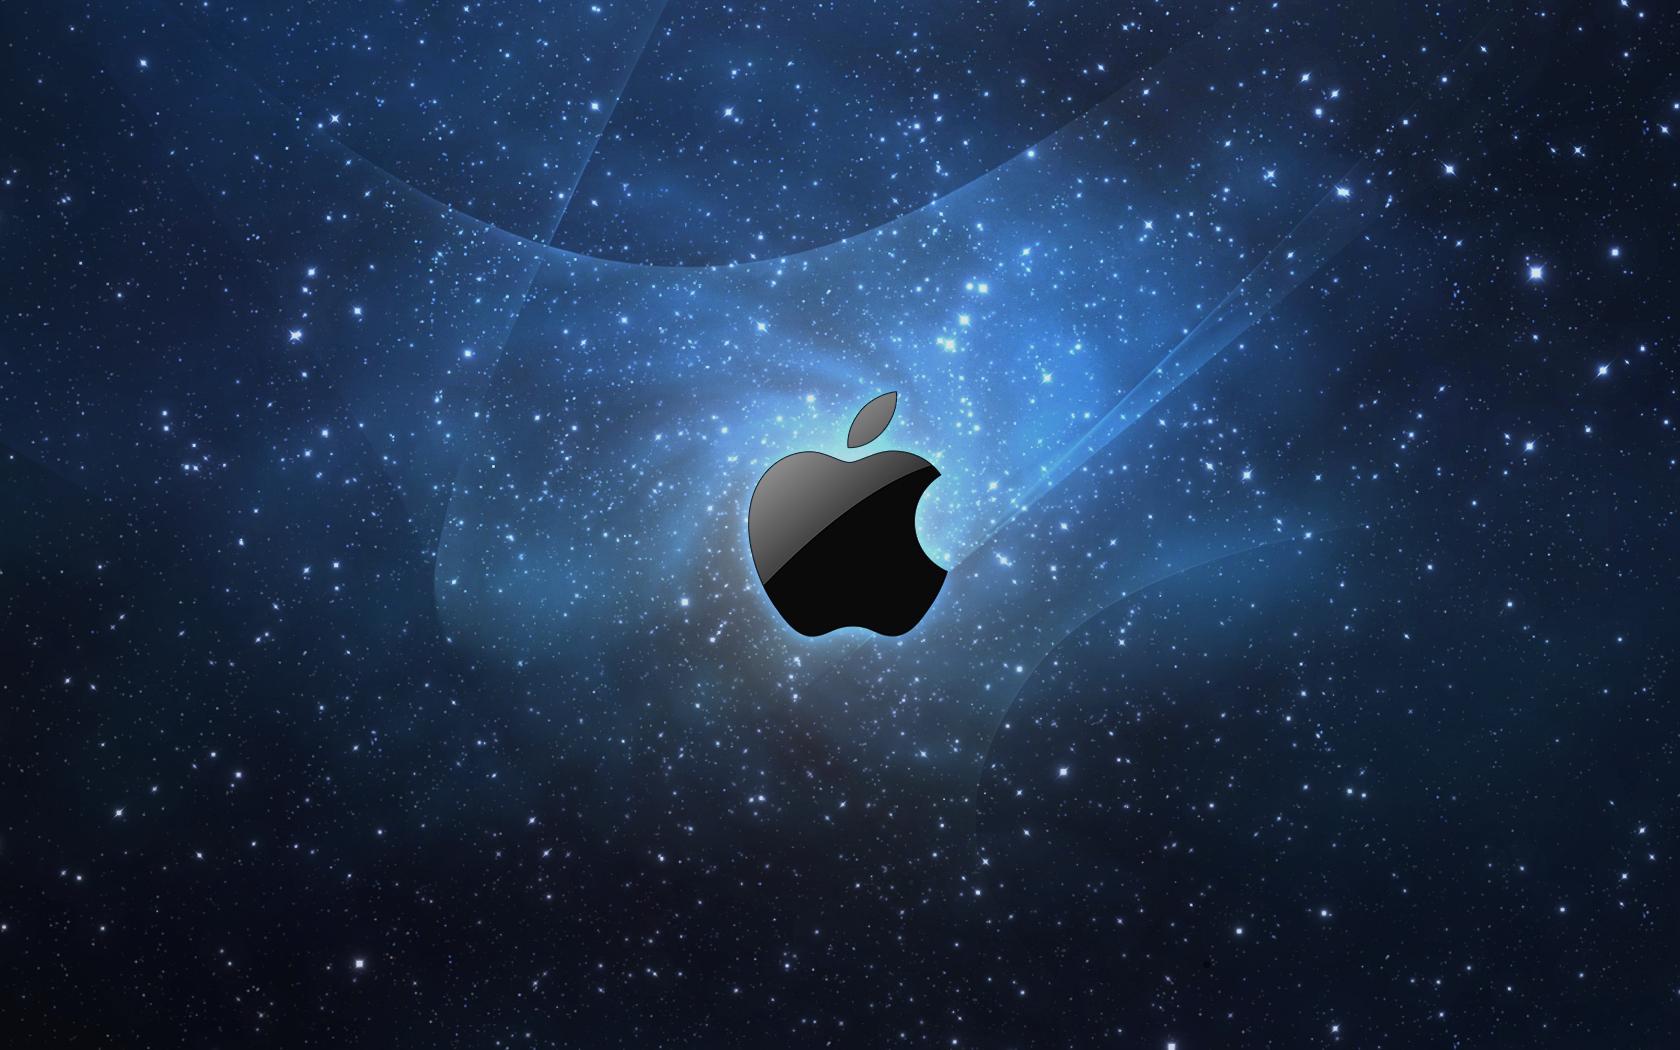 Apple Wallpaper Download HD 1680x1050